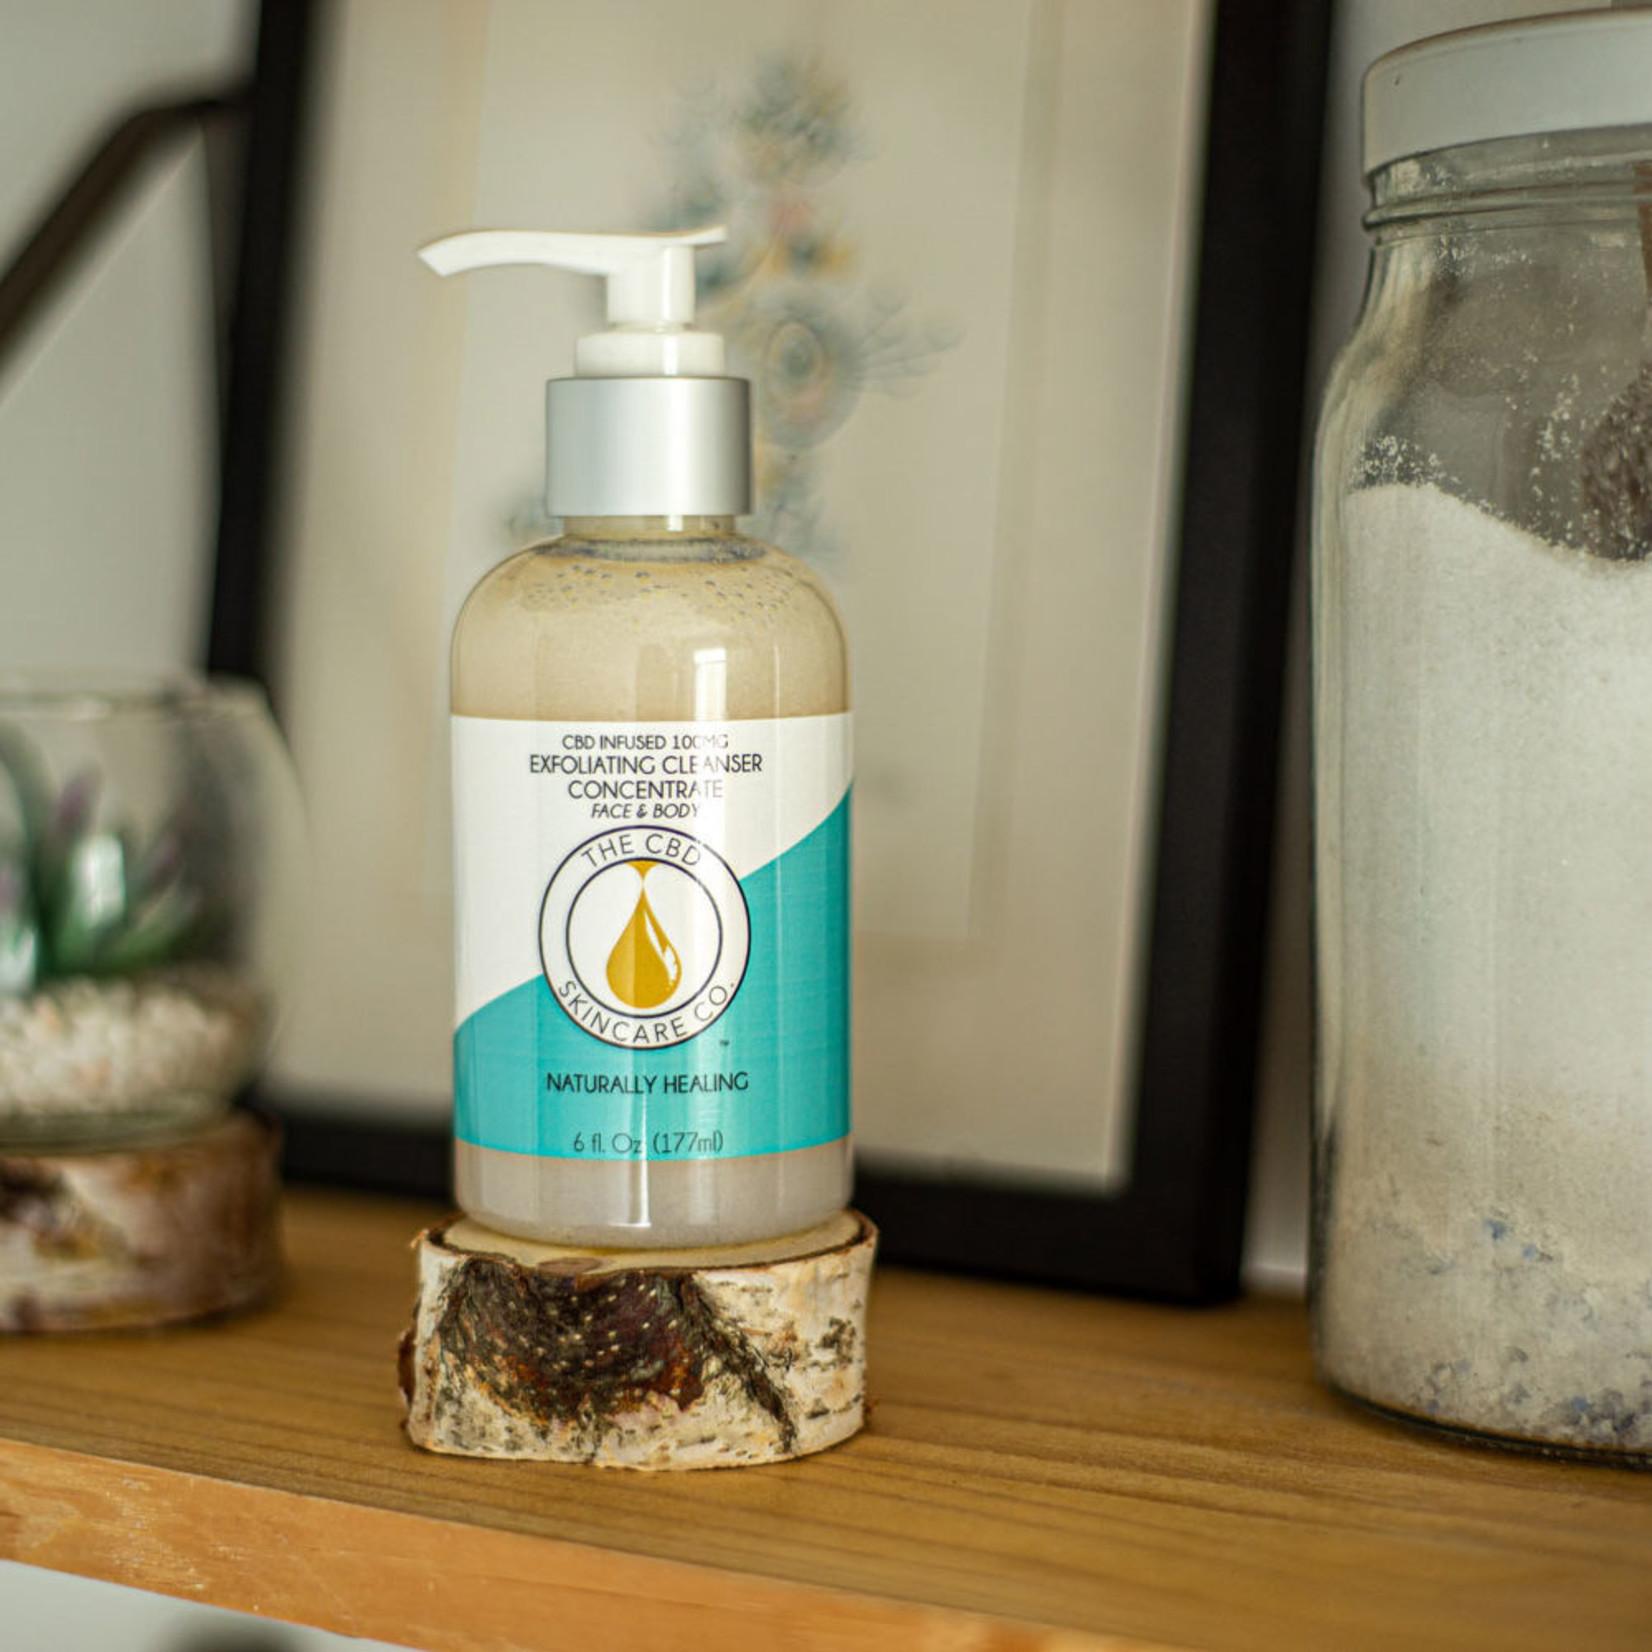 CBD Skincare Company CBD Infused Exfoliating Cleanser